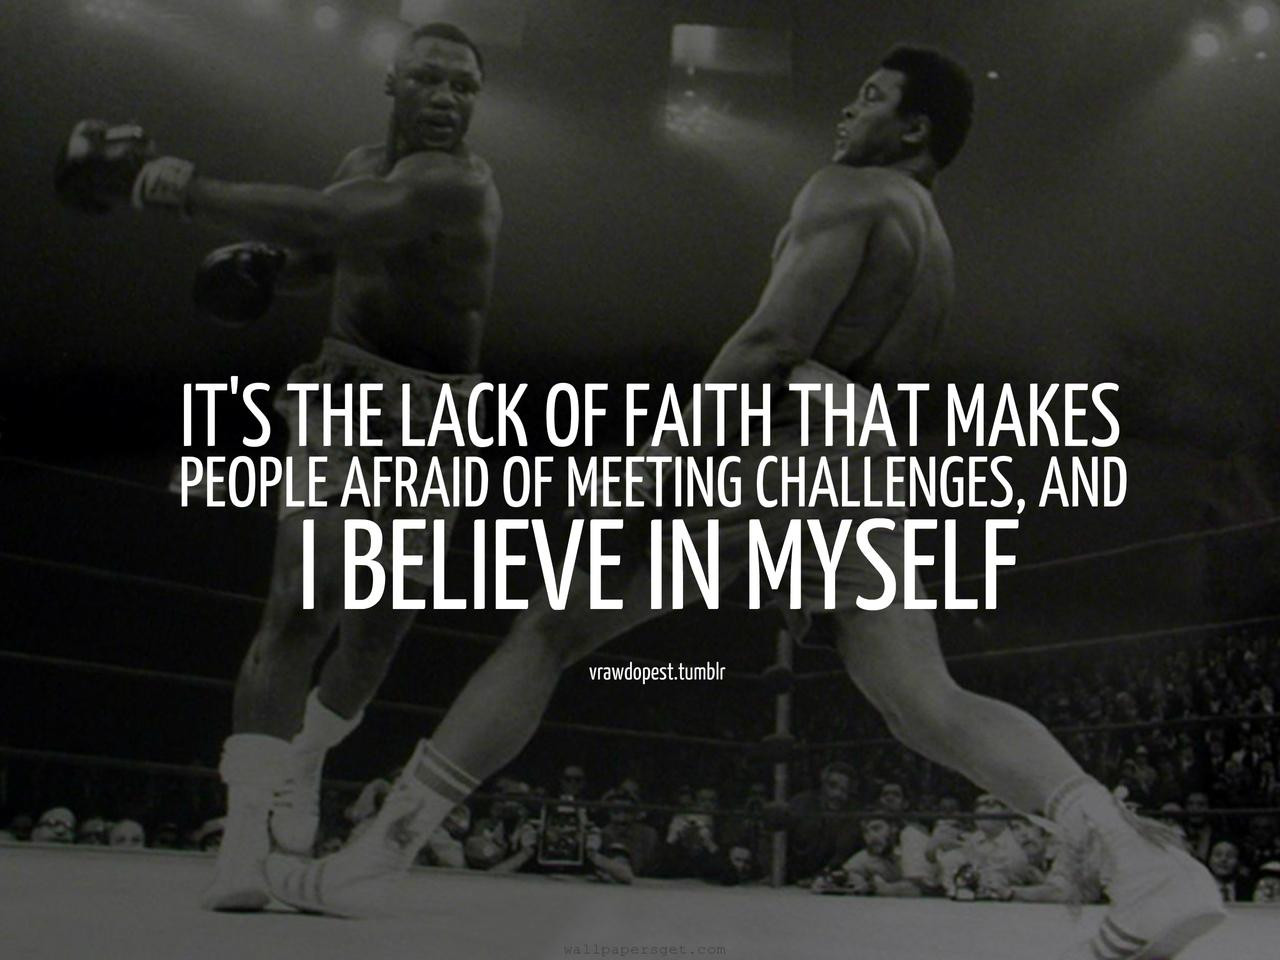 41+] Muhammad Ali Quotes Wallpaper on WallpaperSafari